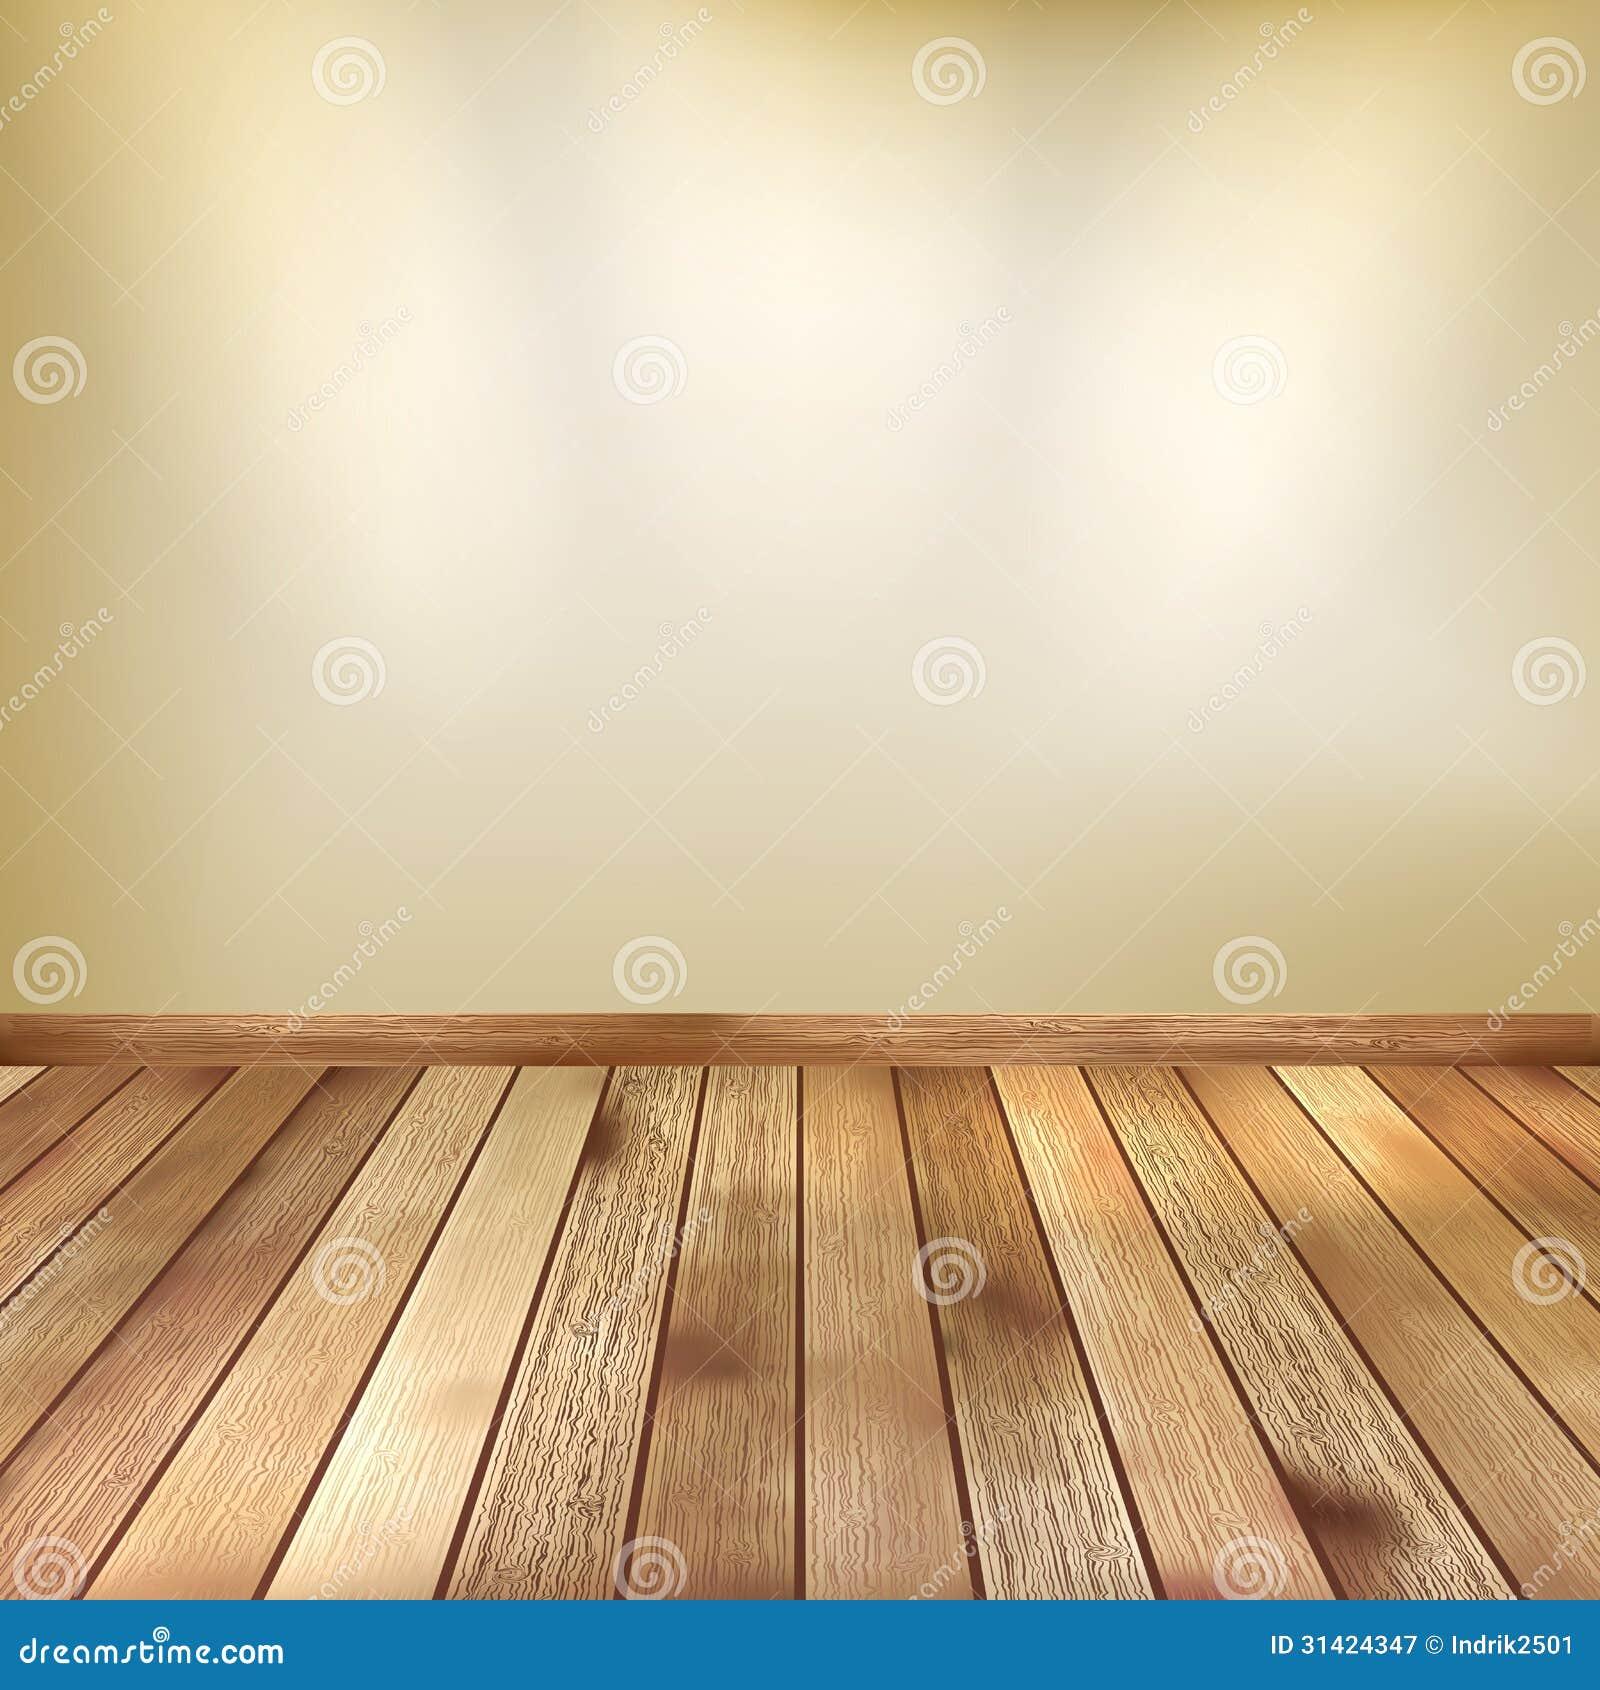 beige wall with spot lights wooden floor eps 10 stock. Black Bedroom Furniture Sets. Home Design Ideas